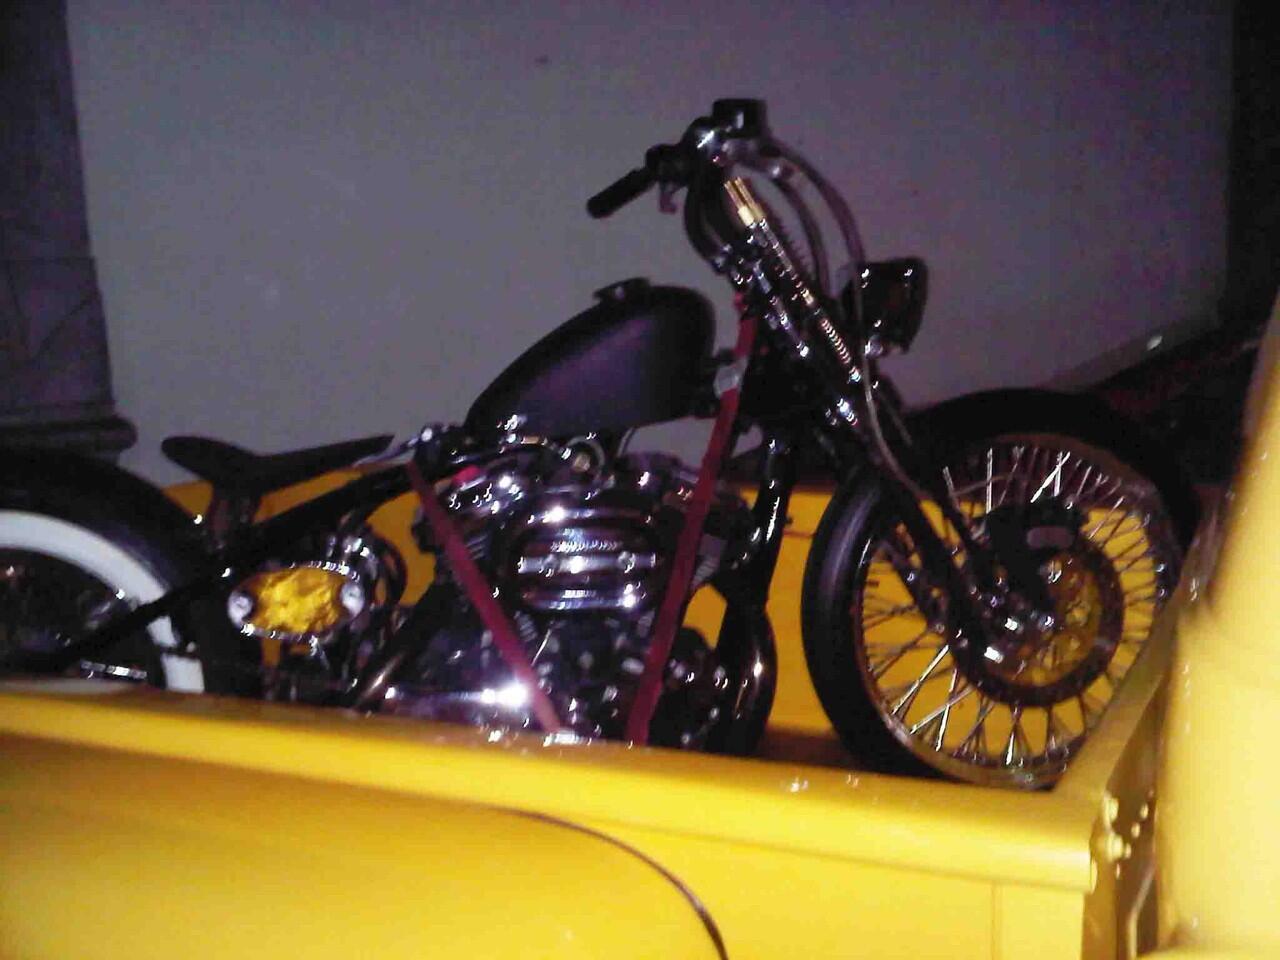 Motor Custom Harley Davidson sportster 1200c tahun 2003